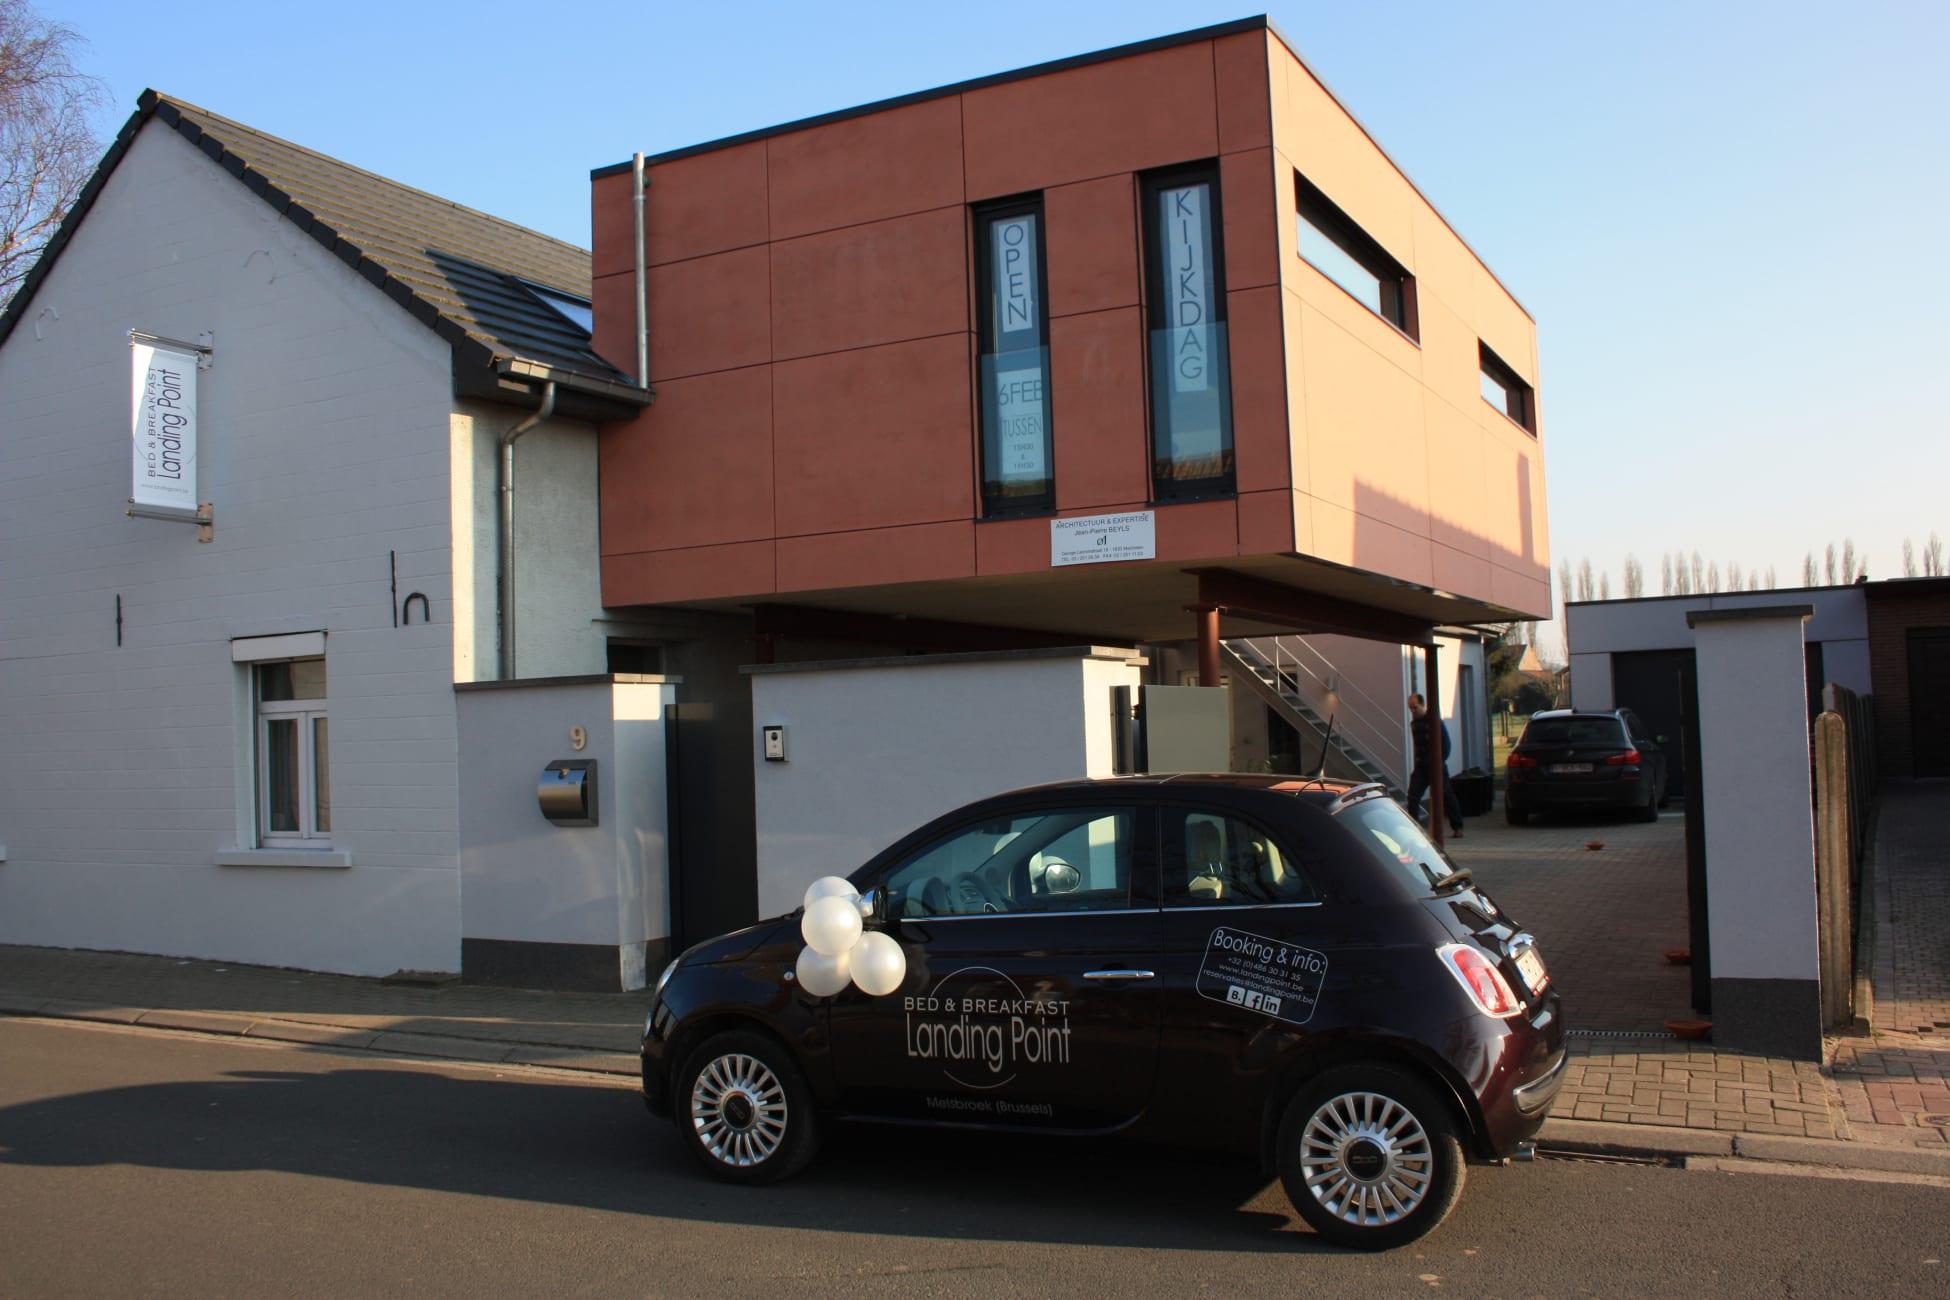 Fiat Garage Mechelen : Bed & breakfast landing point steenokkerzeel trivago.com